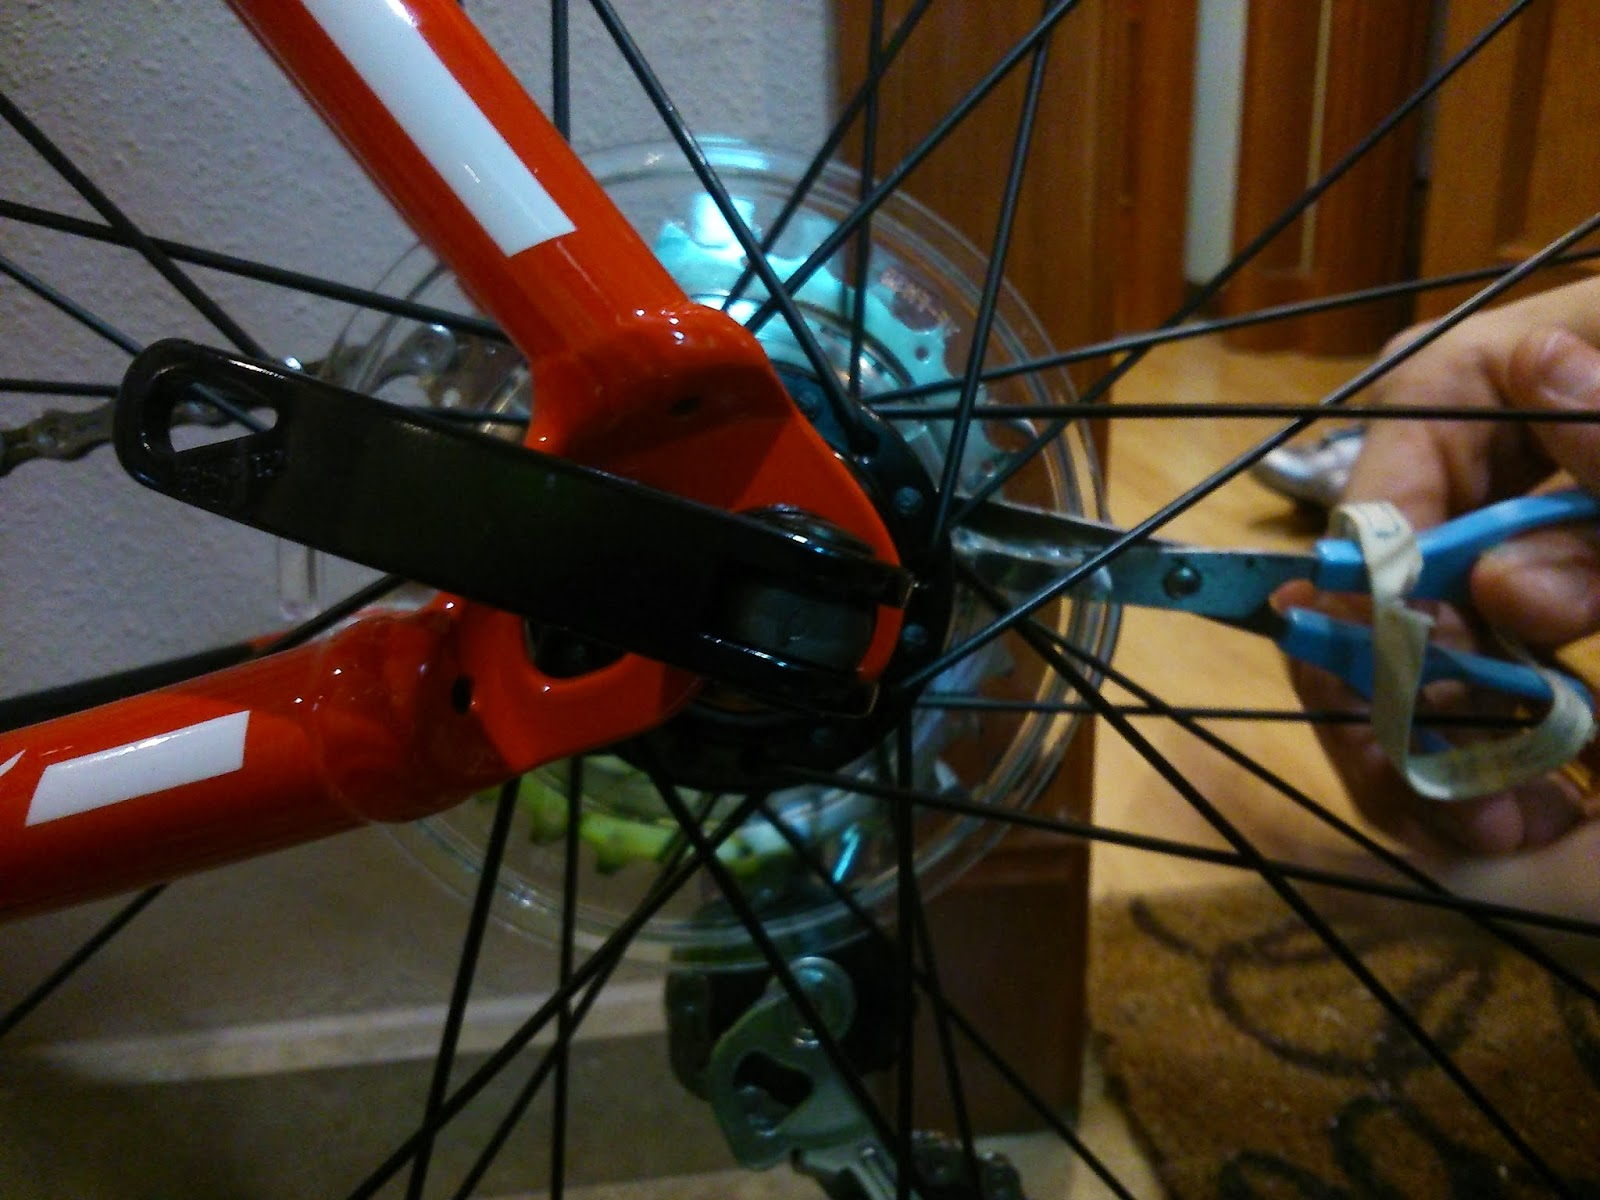 plastico protector rueda atras bicicleta